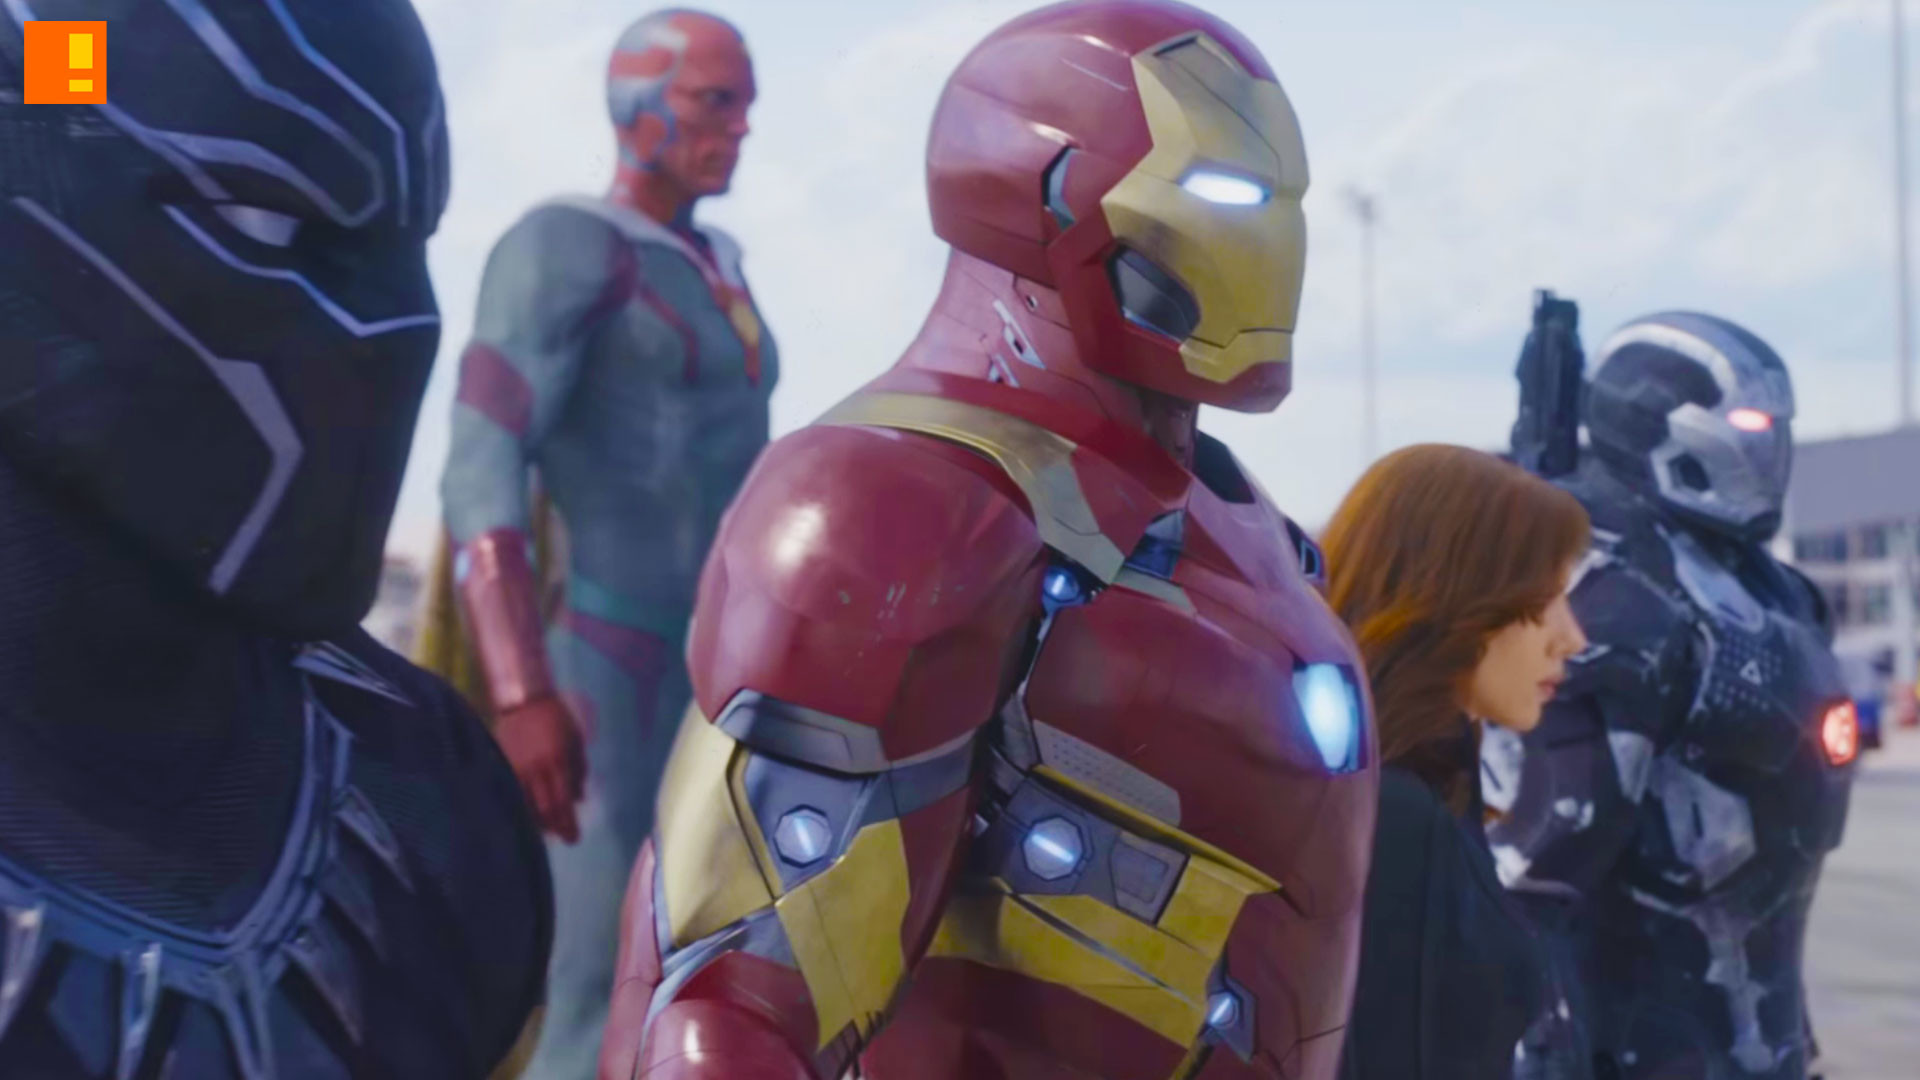 captain america .civil war. team iron man. iron man. captain america Civil  …